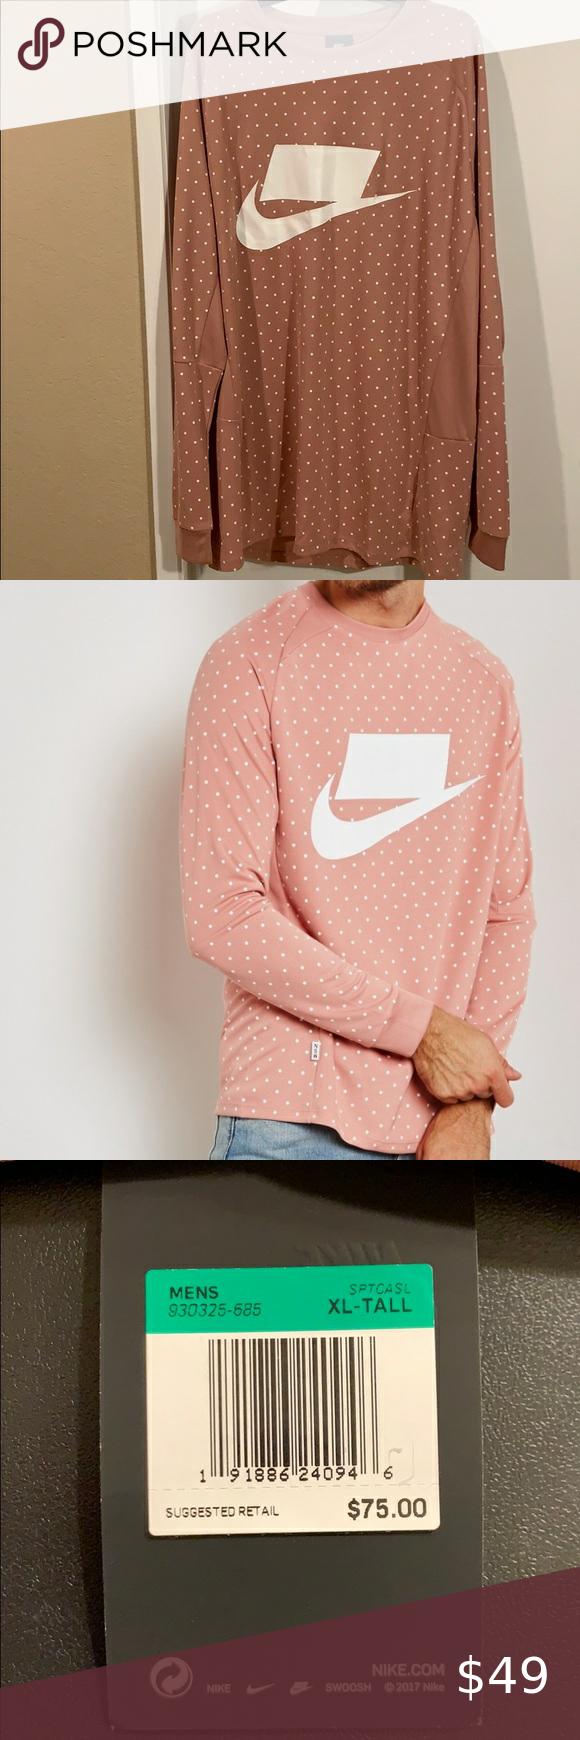 Nike Nsw Knit Sweatshirt Knit Sweatshirt Sweatshirts Sweatshirt Shirt [ 1740 x 580 Pixel ]